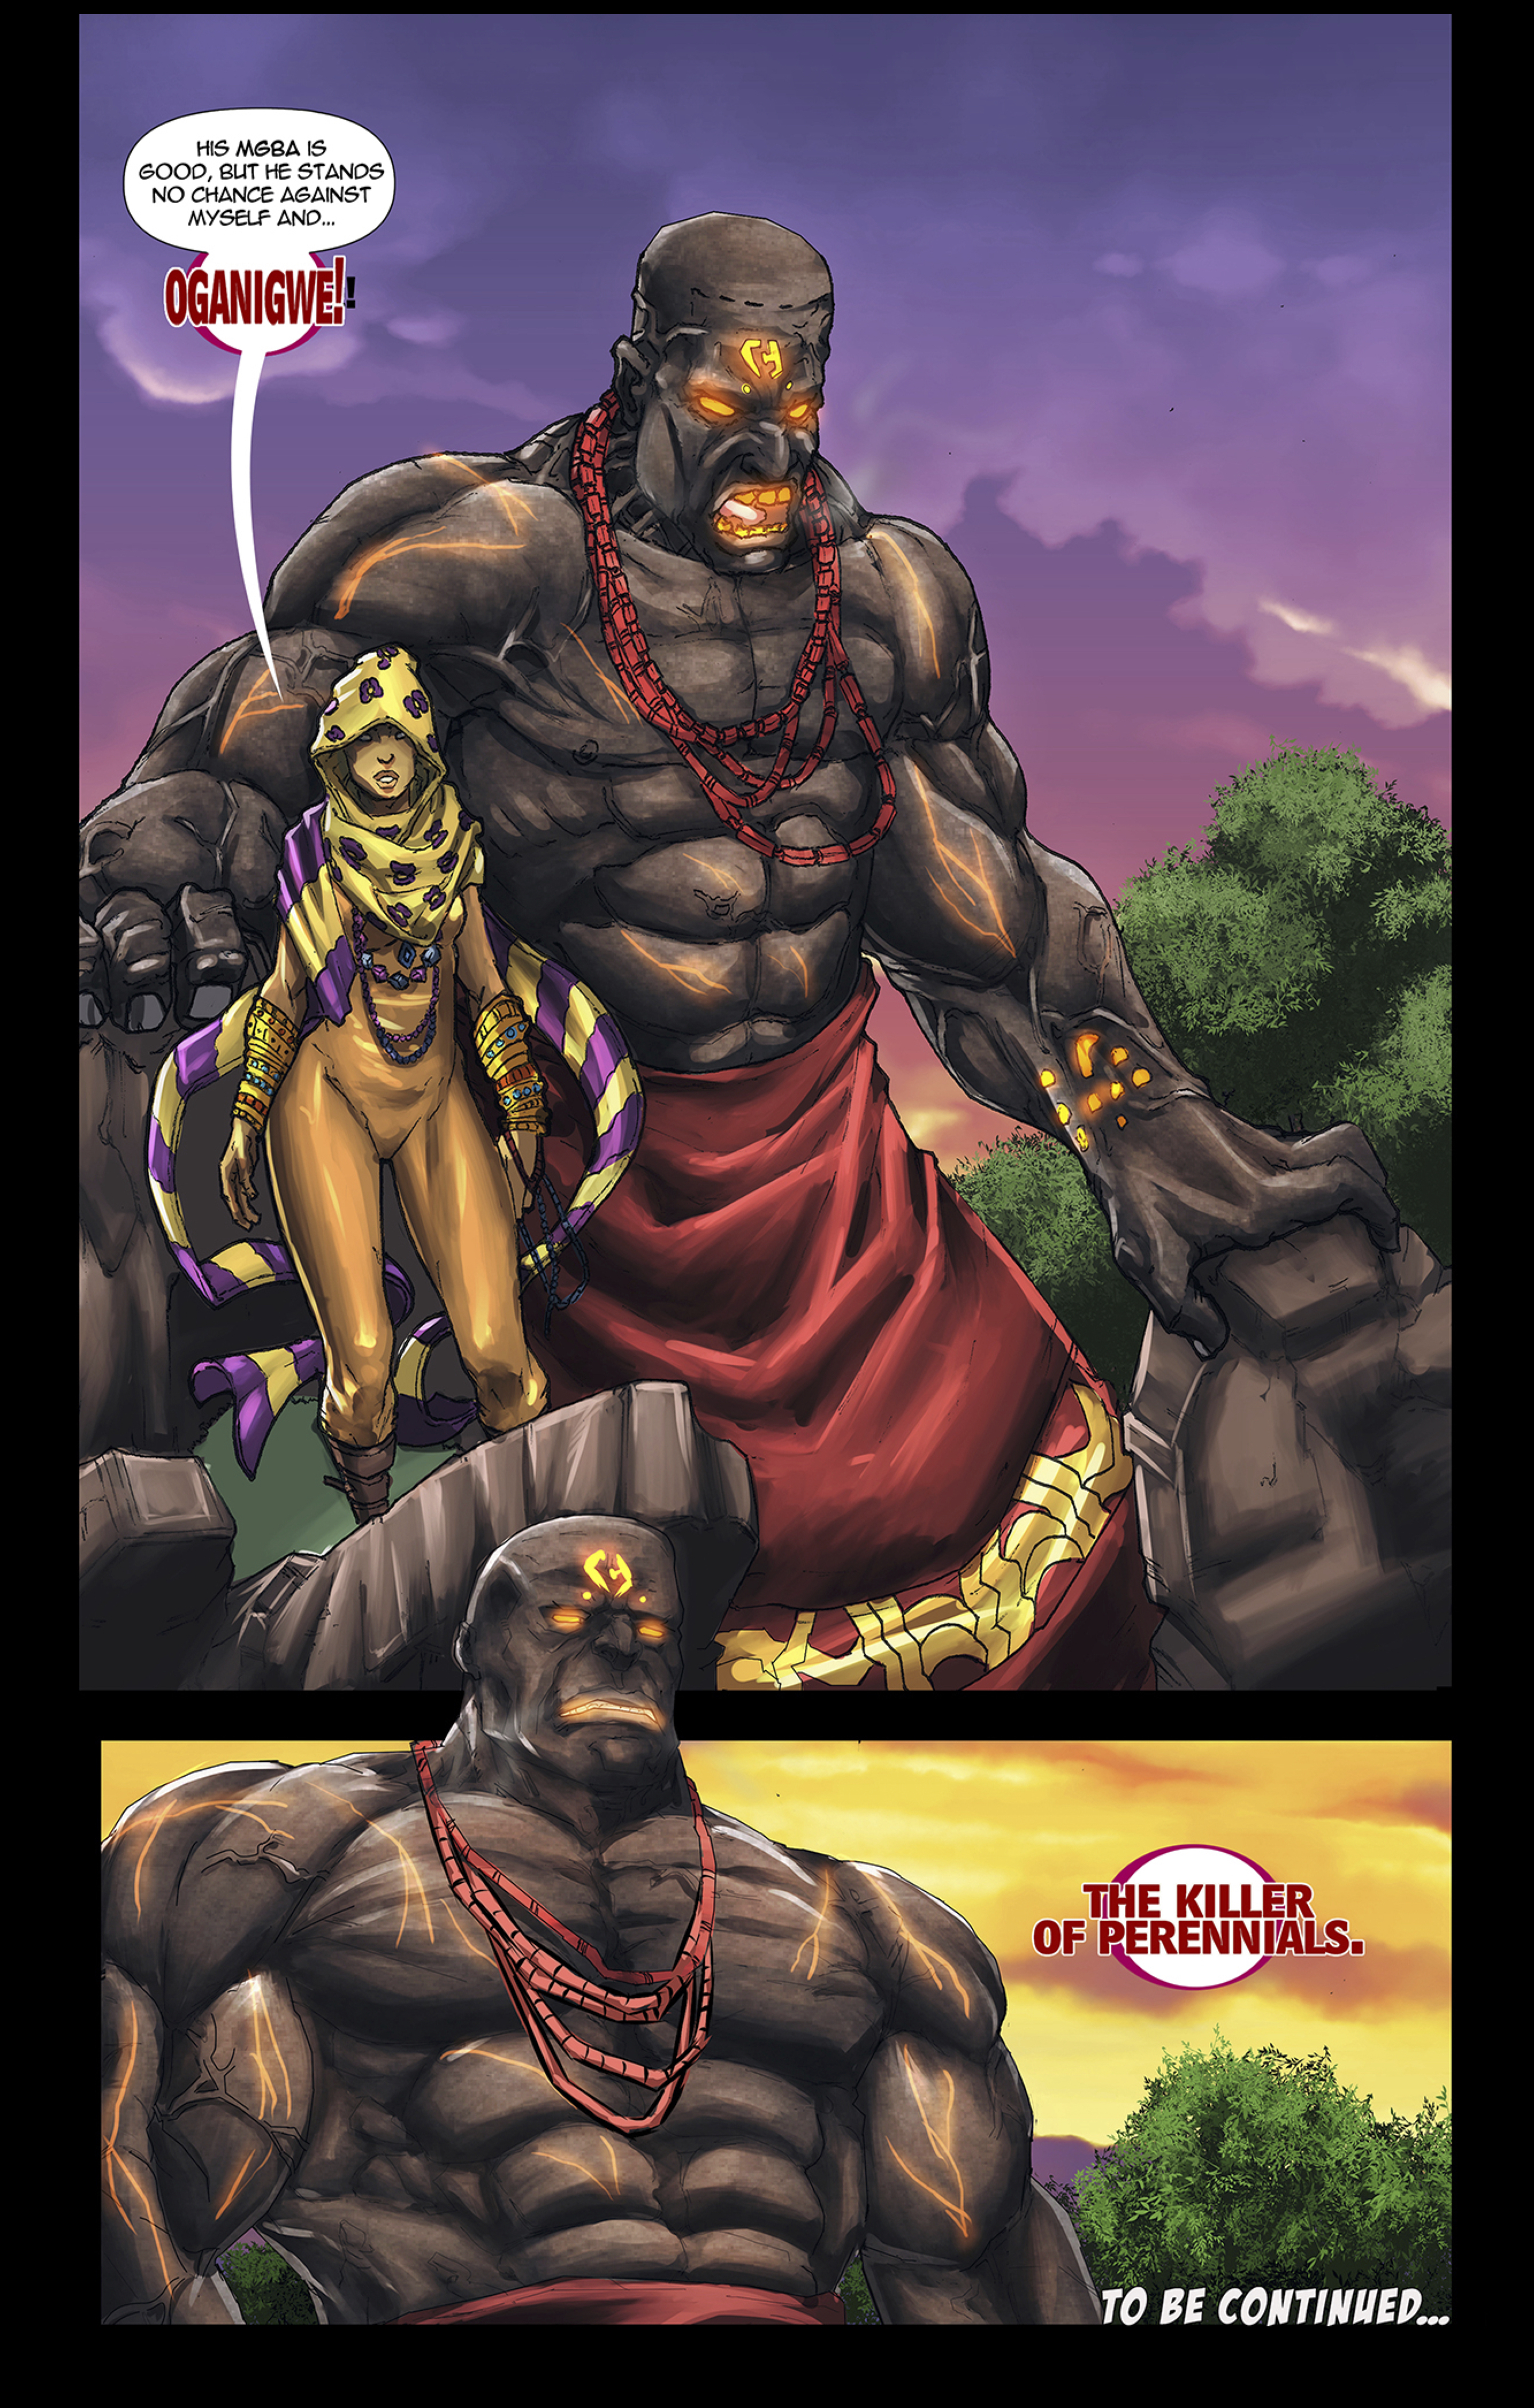 Oganigwe, Killer of Perennials in the African comic, Scion: Immortal